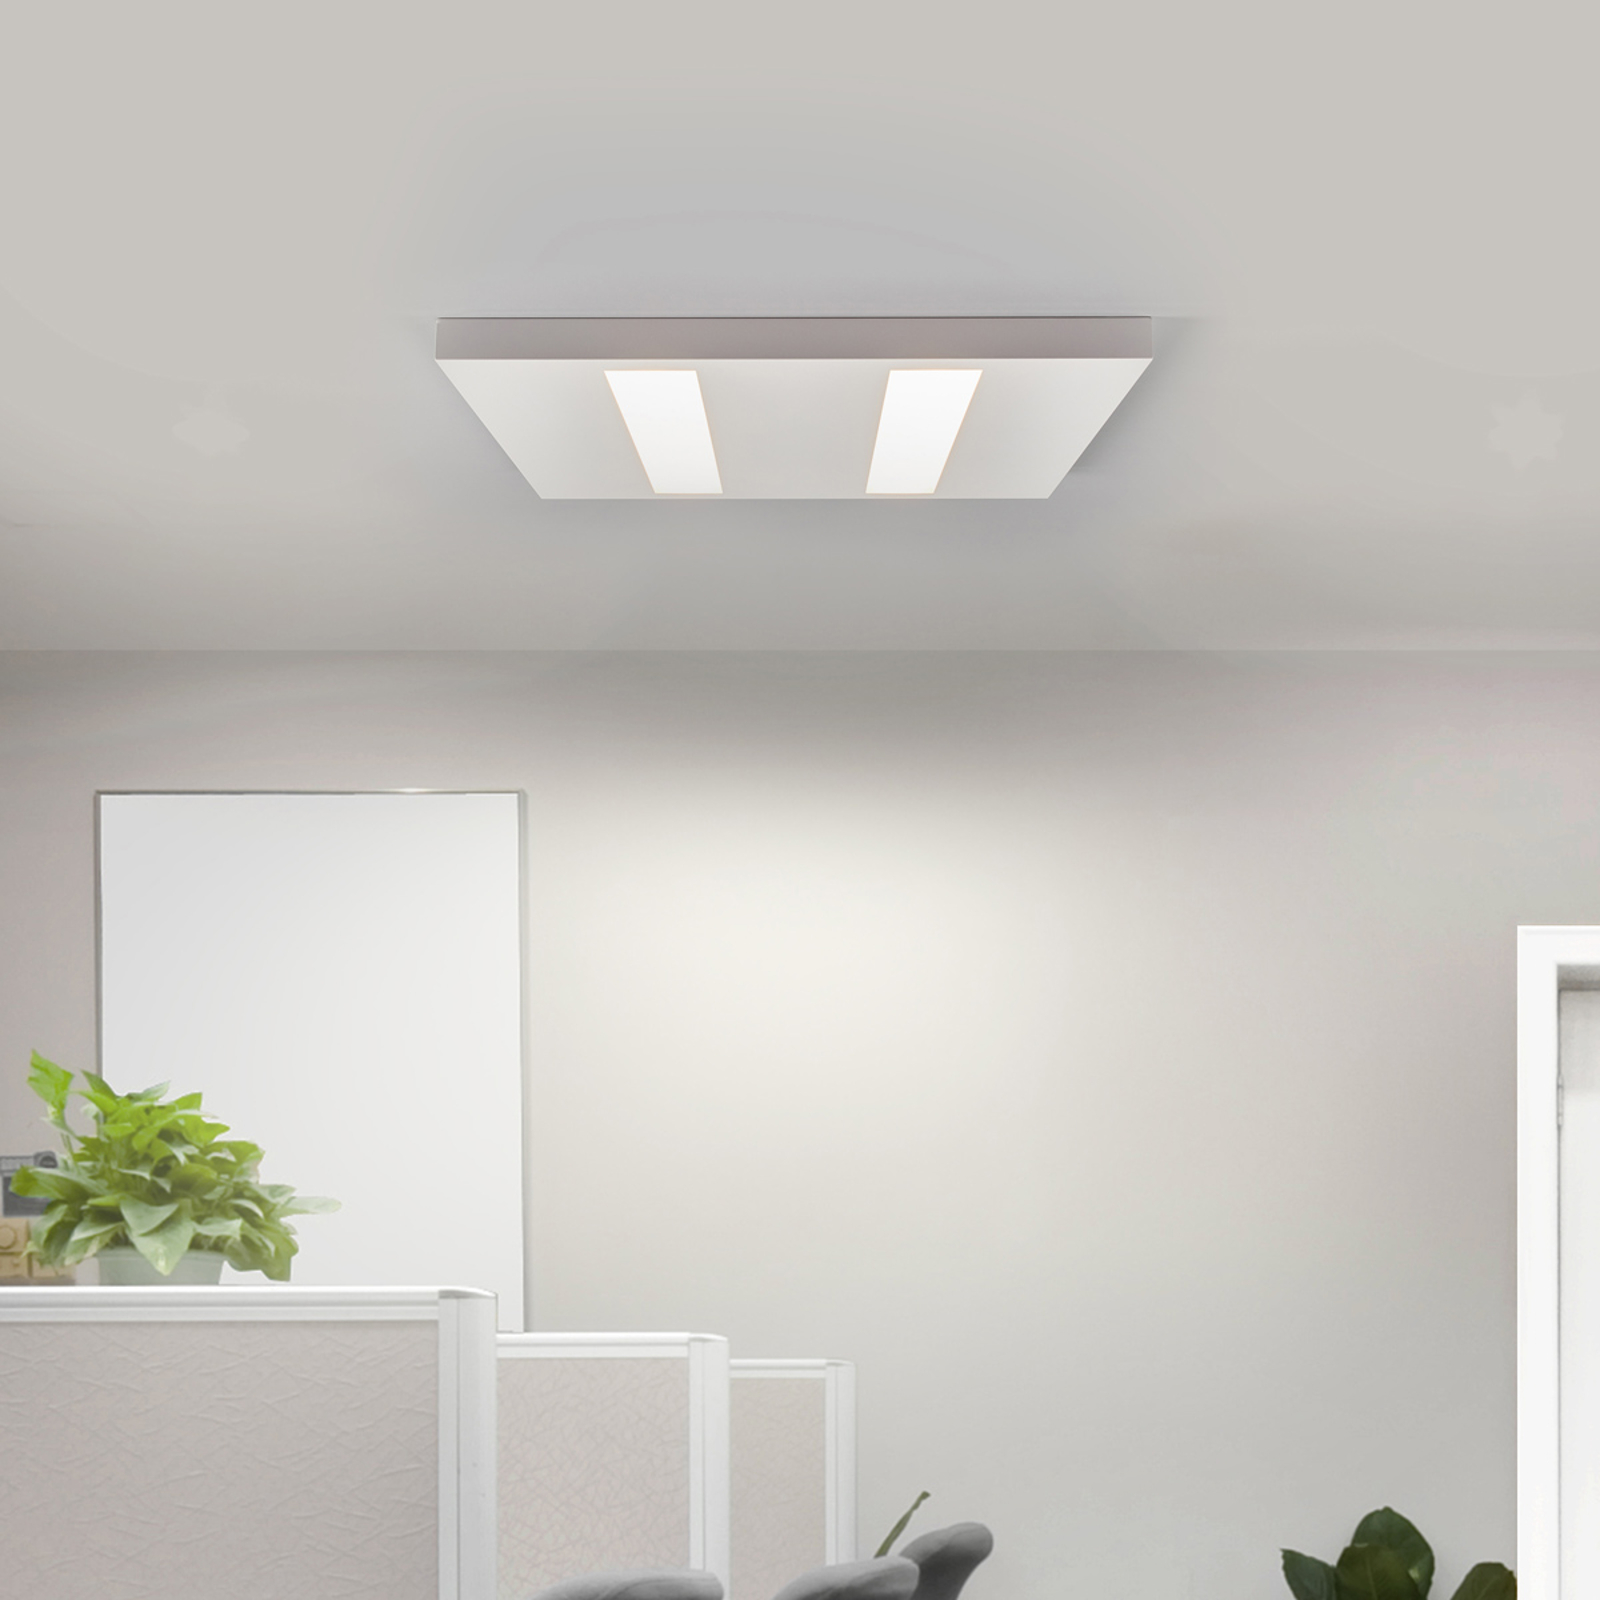 Lum. superf. LED plana 37W blanca, LED OSRAM